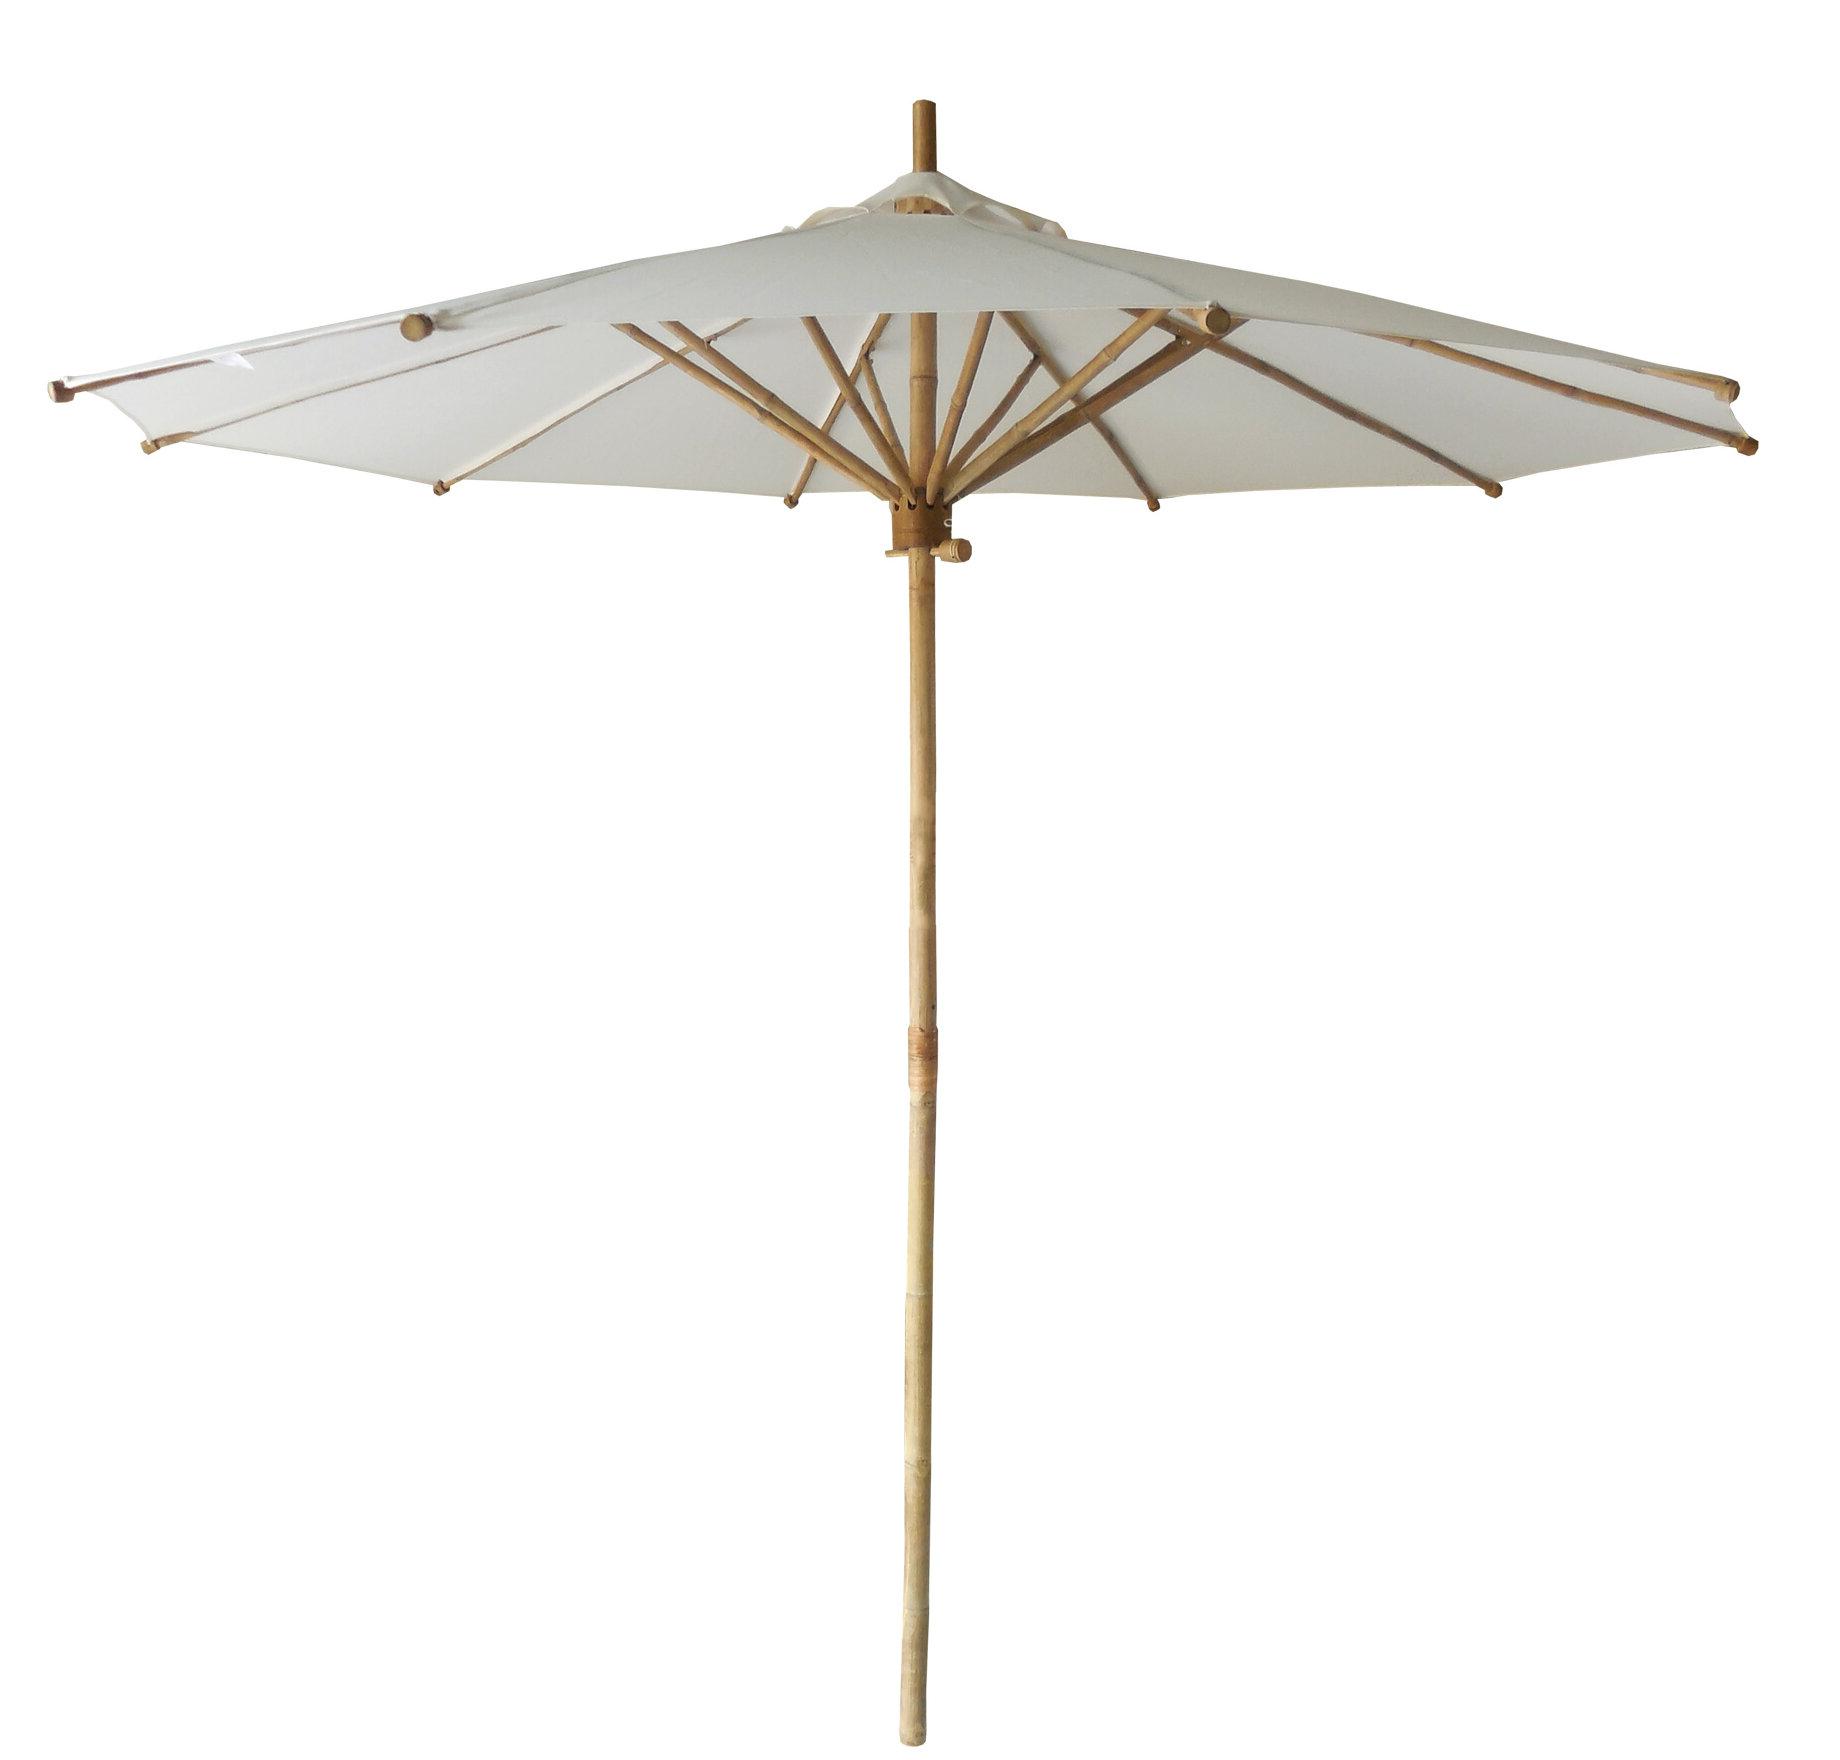 2020 Esai Beach Umbrellas Inside Esai 7' Beach Umbrella (Gallery 1 of 20)